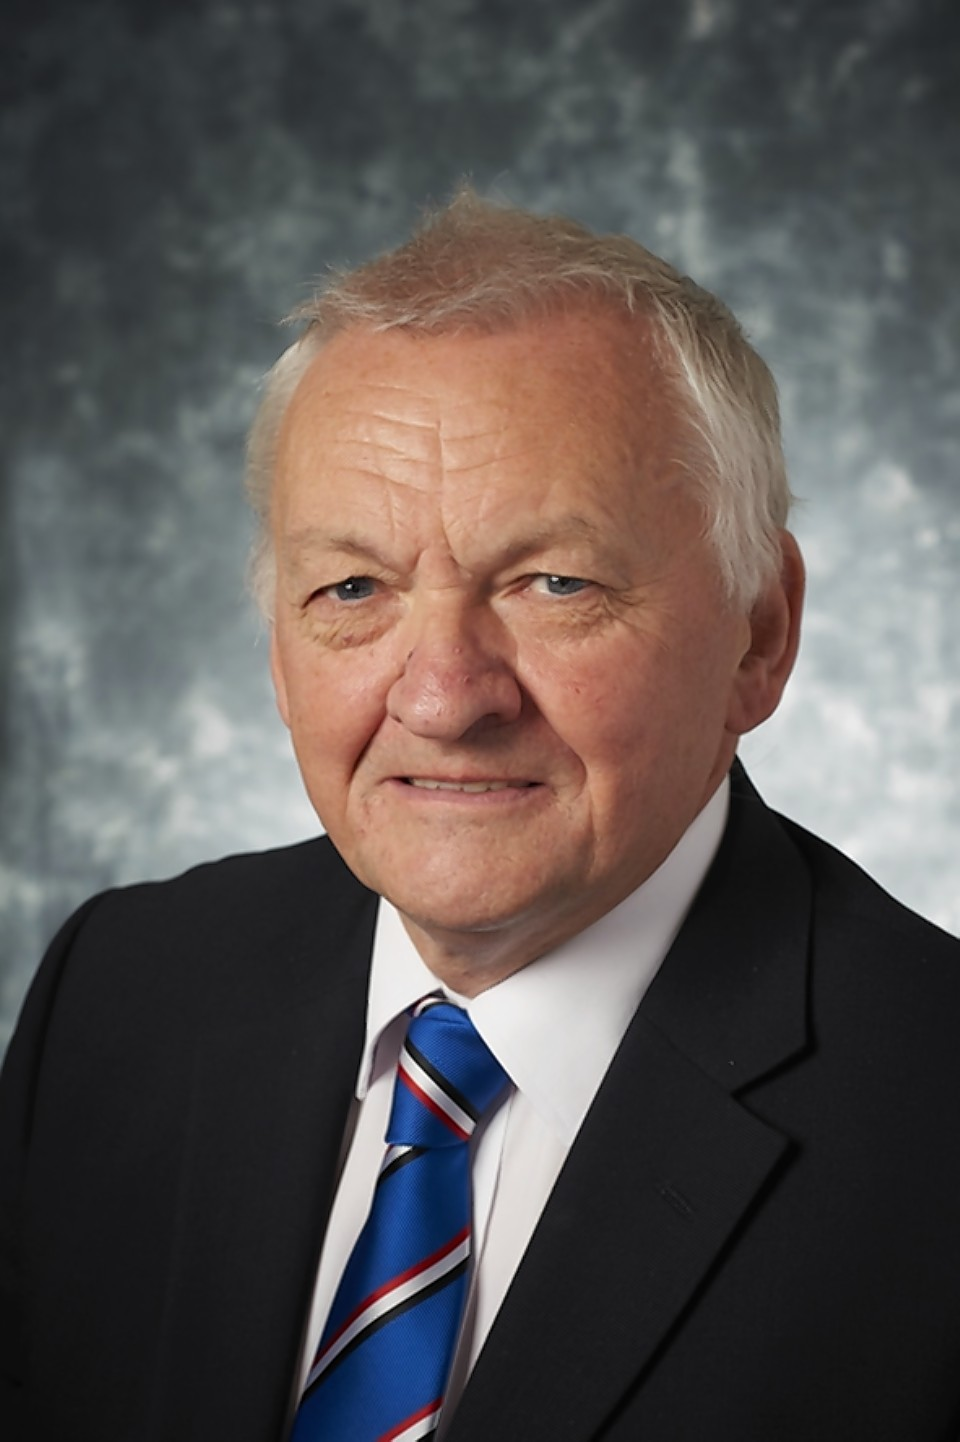 Councillor Drew Millar